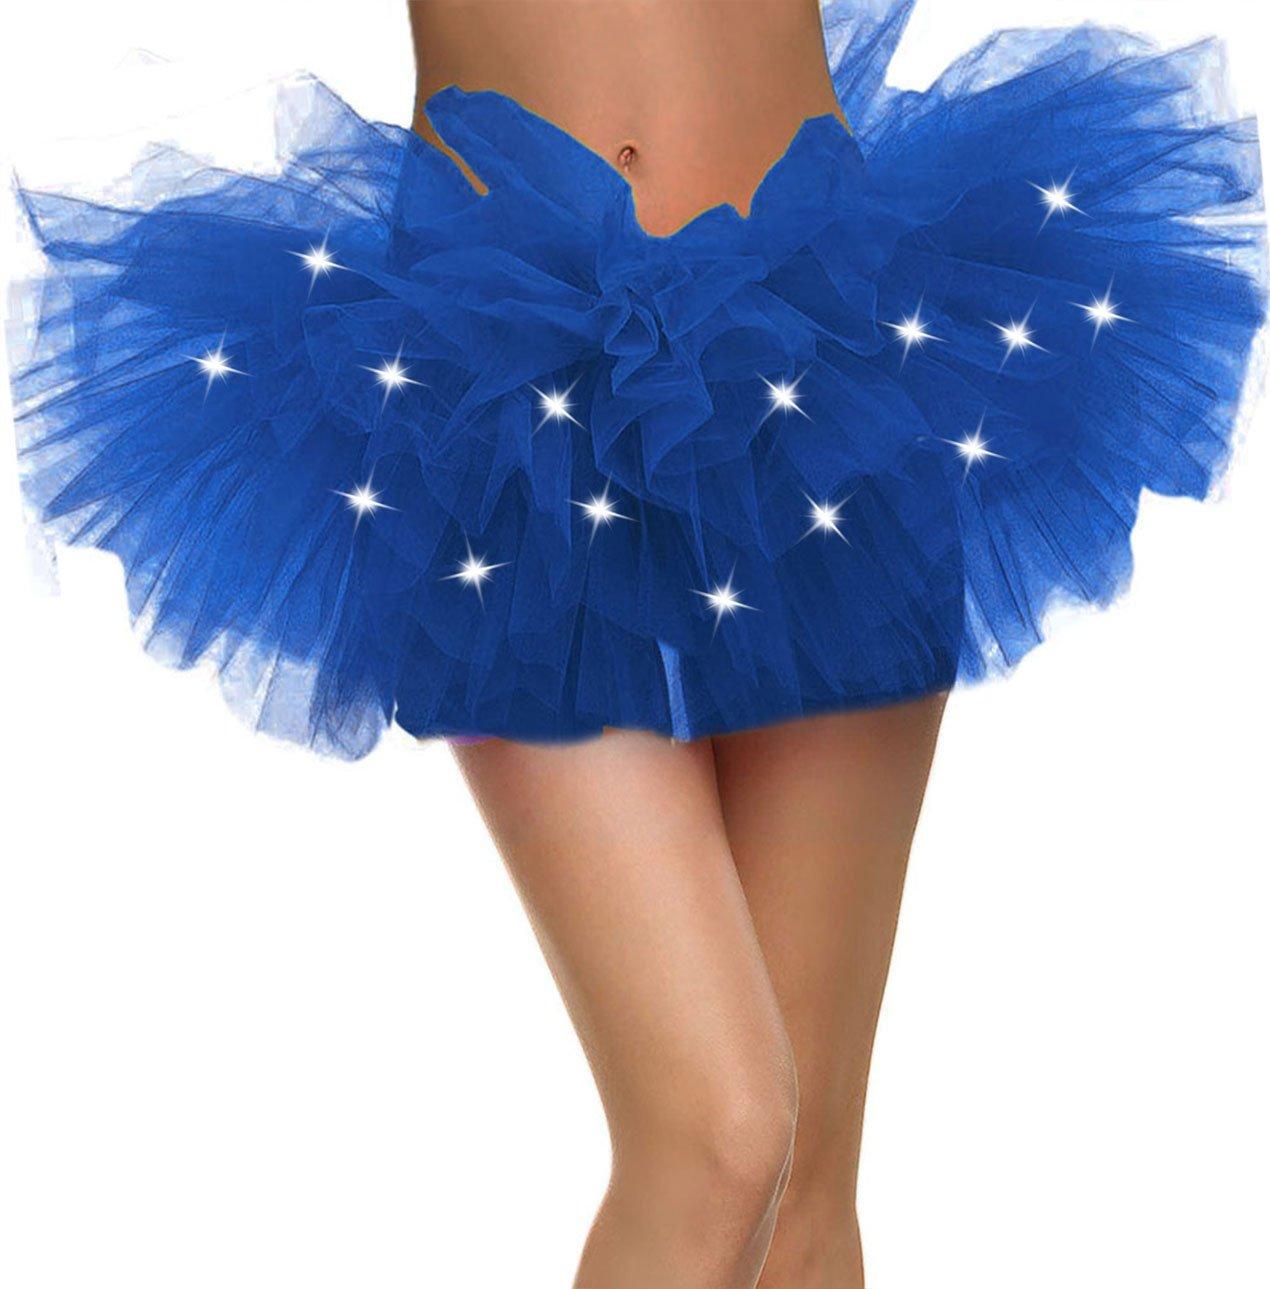 Blue Tutu Women's LED Light Up Neon 5 Layered Tulle Tutu Skirt, Royal Blue